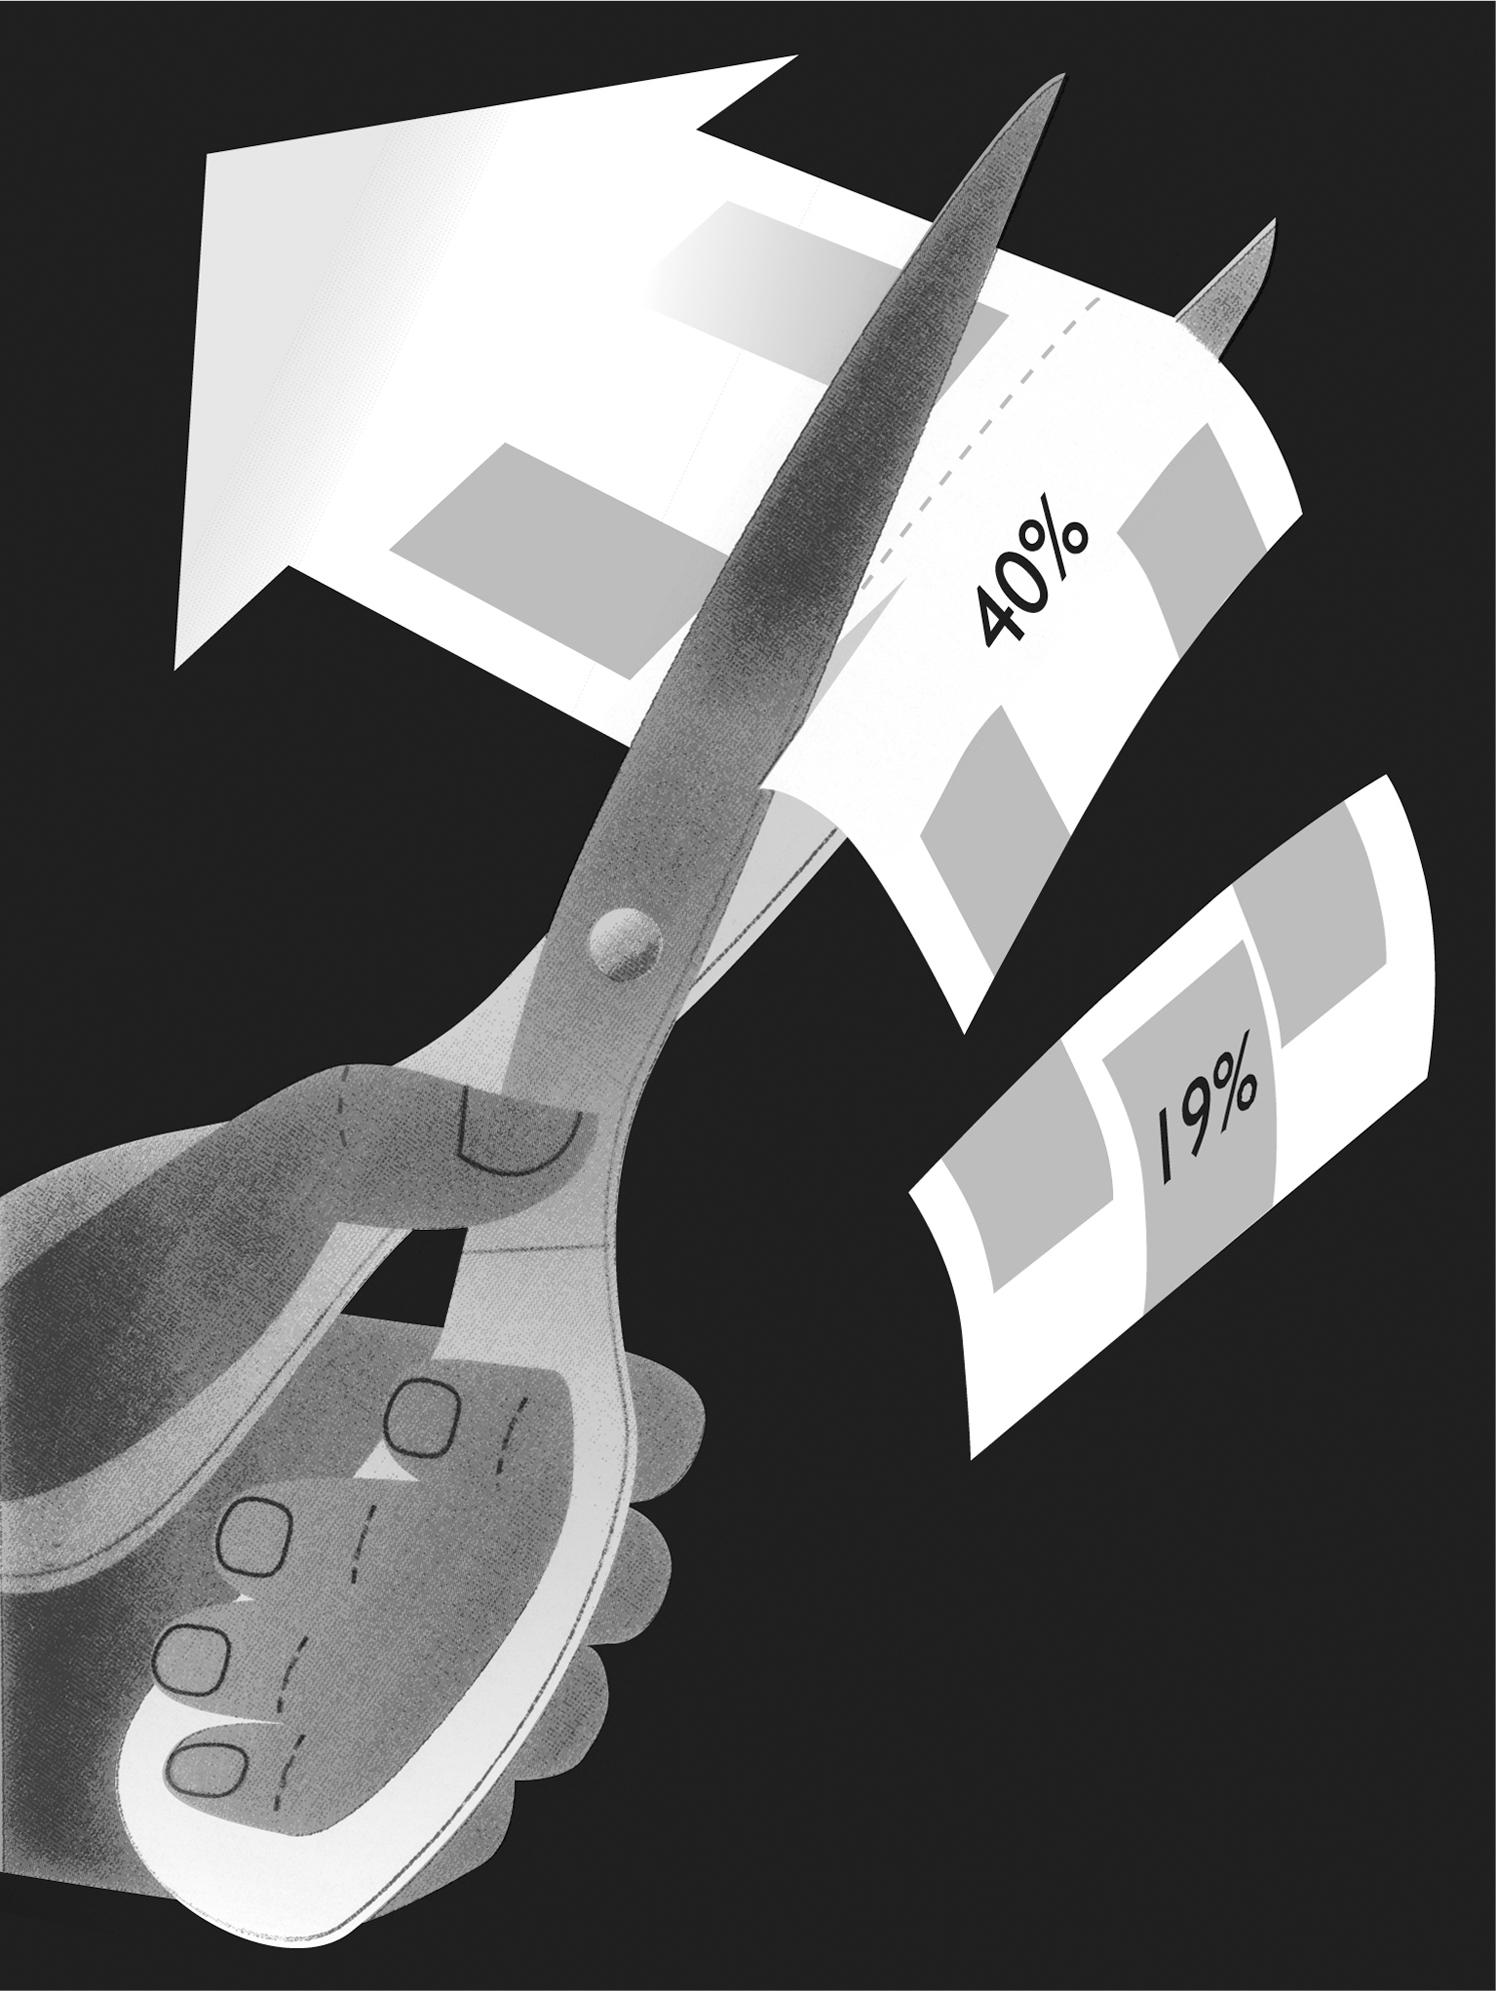 Mortgage Rates Cut